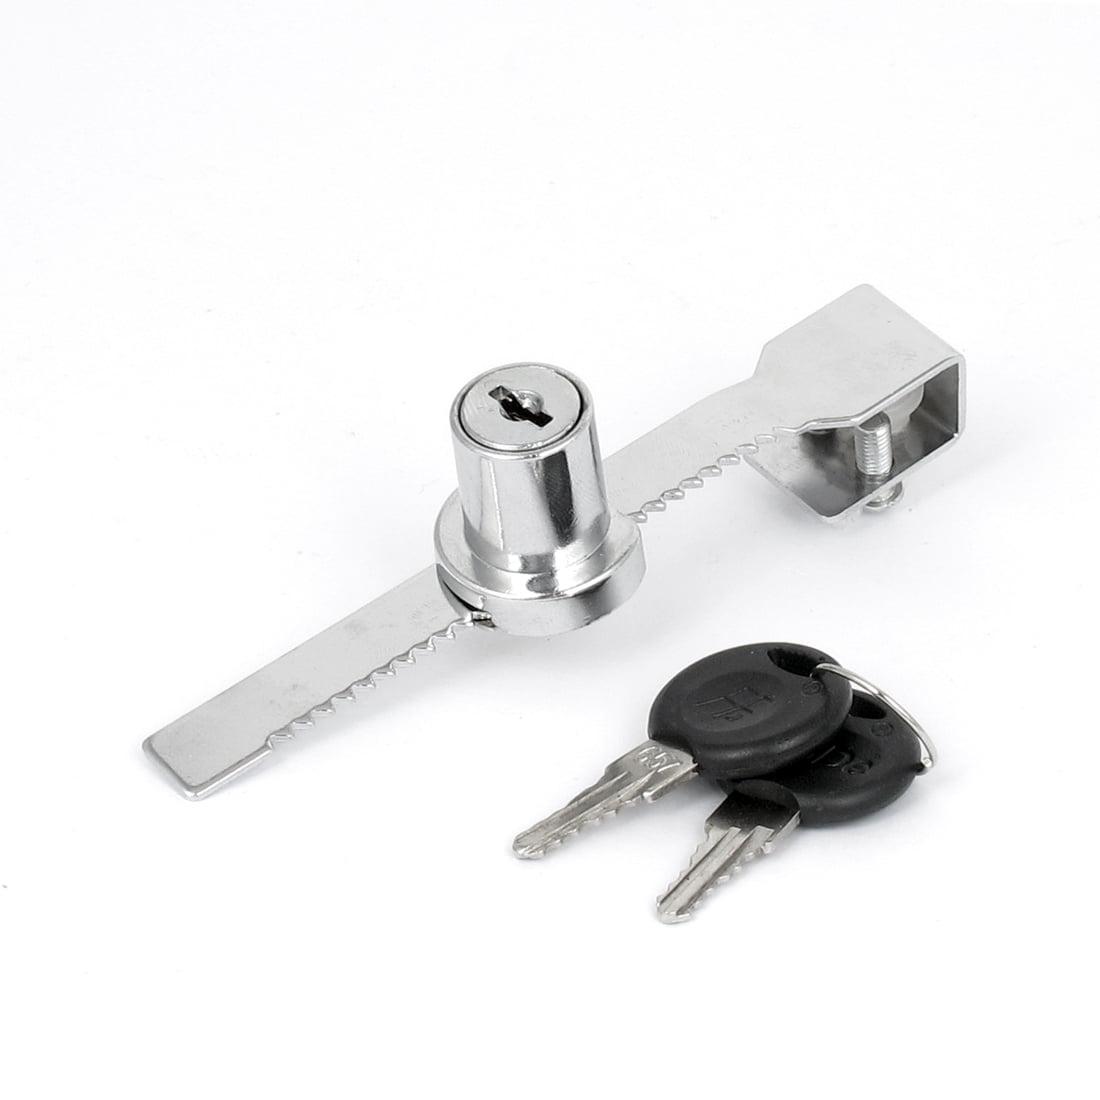 Drawer Display Cabinet Display Cabinet Sliding Glass Door Lock Window Ratchet Lock with Key 1